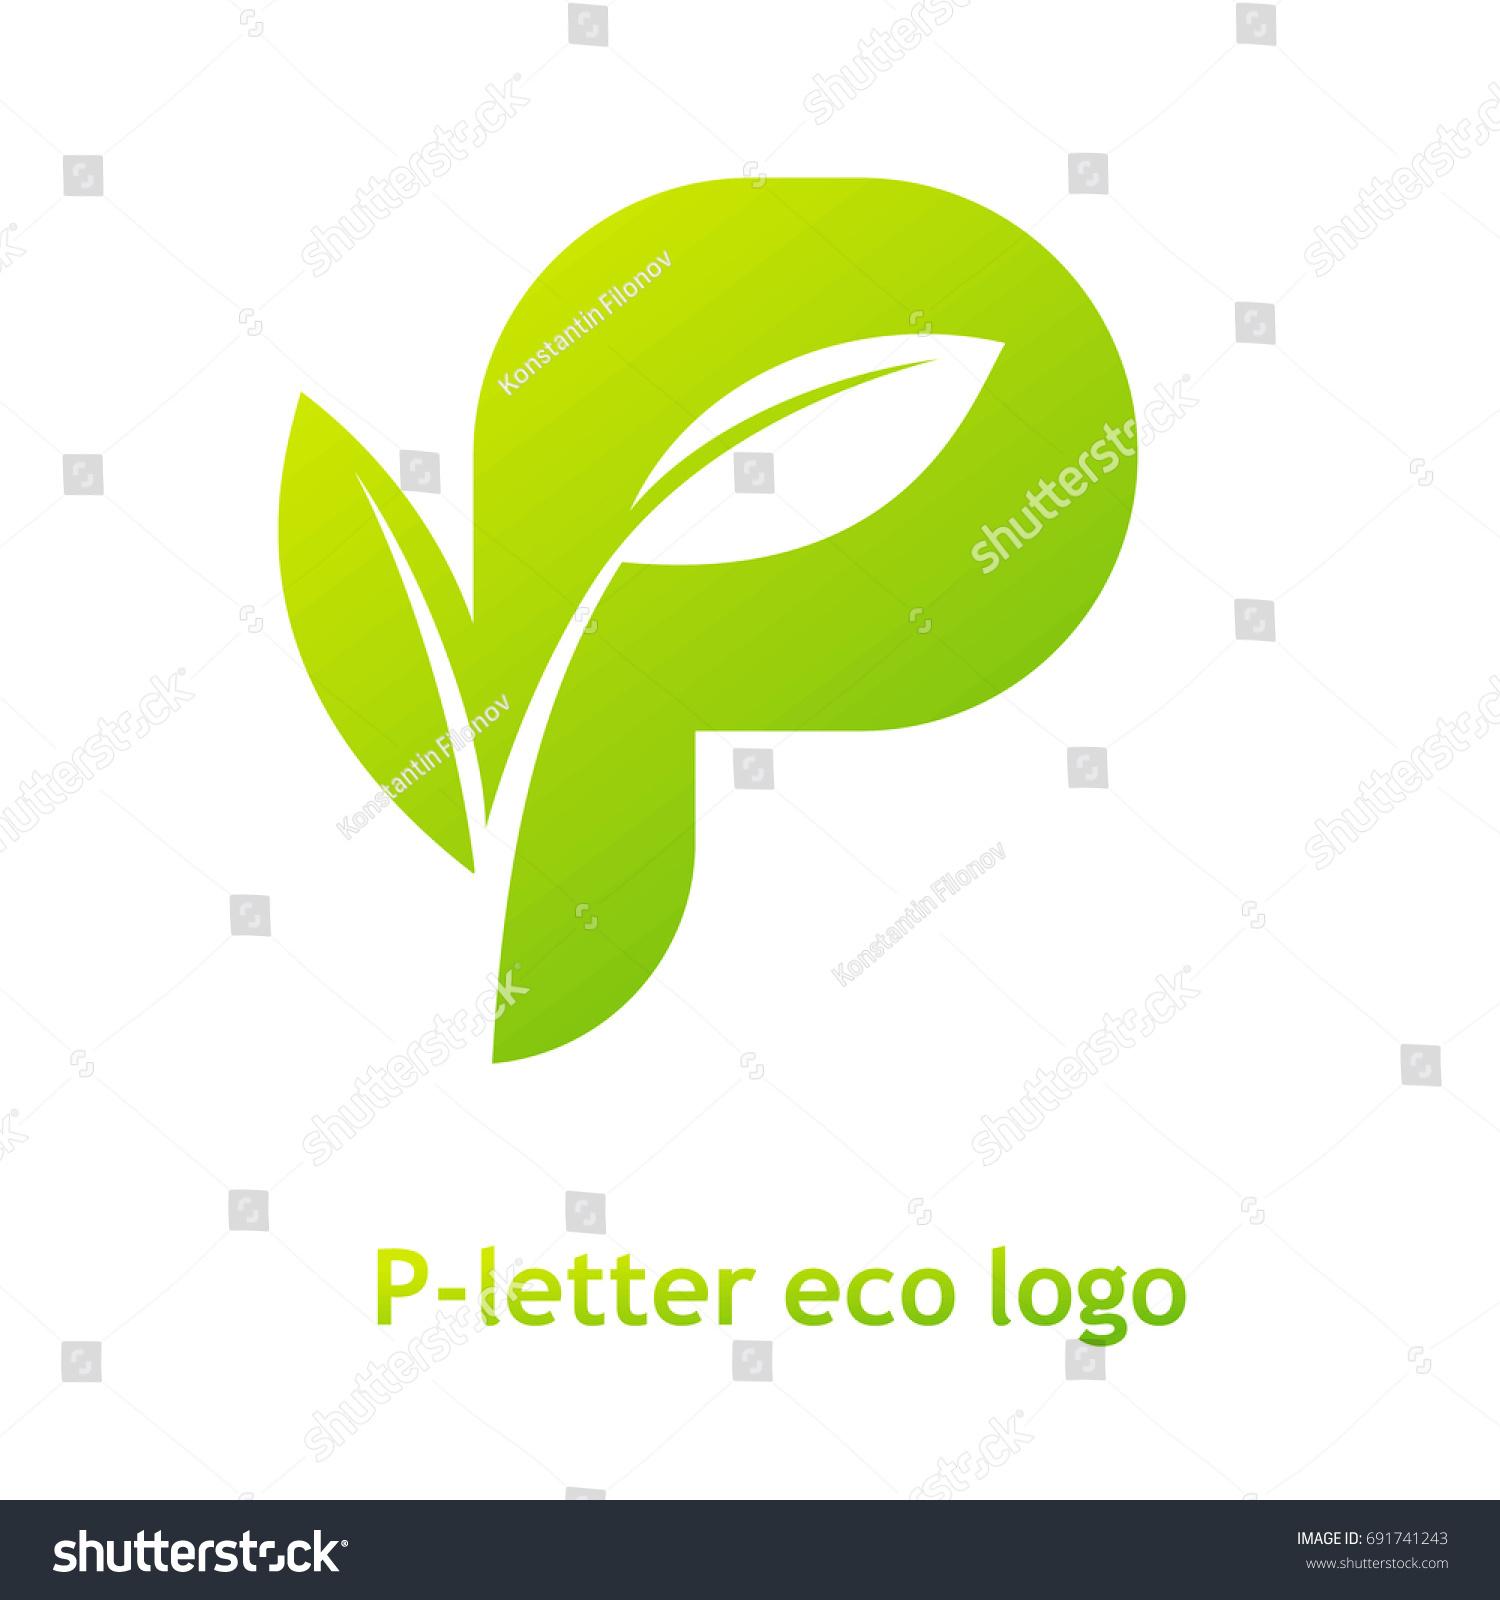 Stunning bio logo vector pics